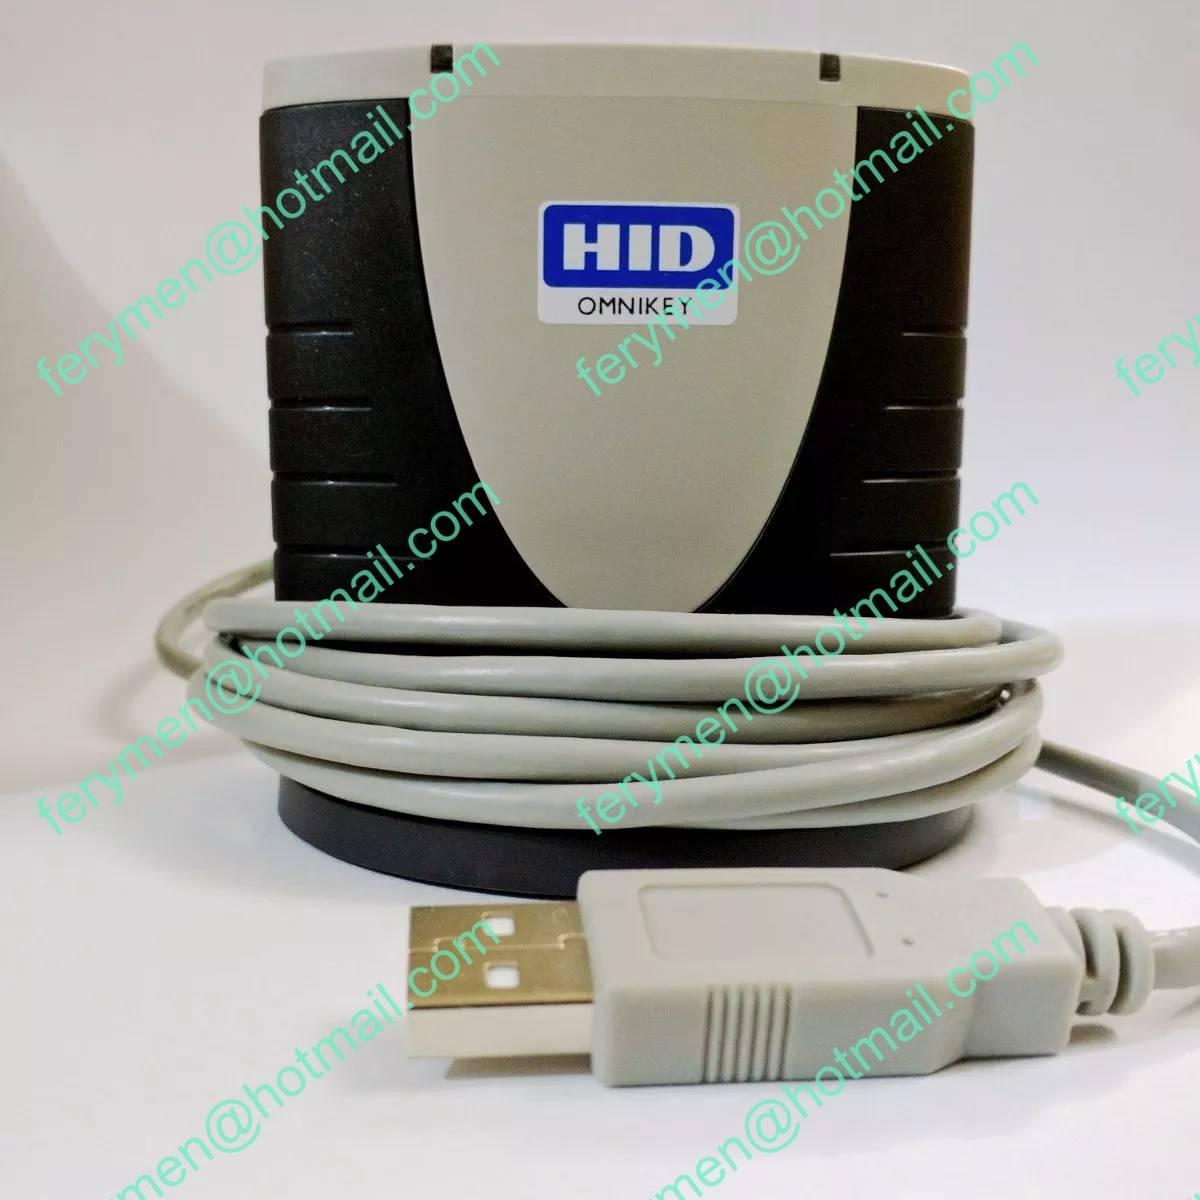 MCR200 EMV IC TARJETA INTELIGENTE CHIP Y BANDA MAGNETICA  - Foto 10